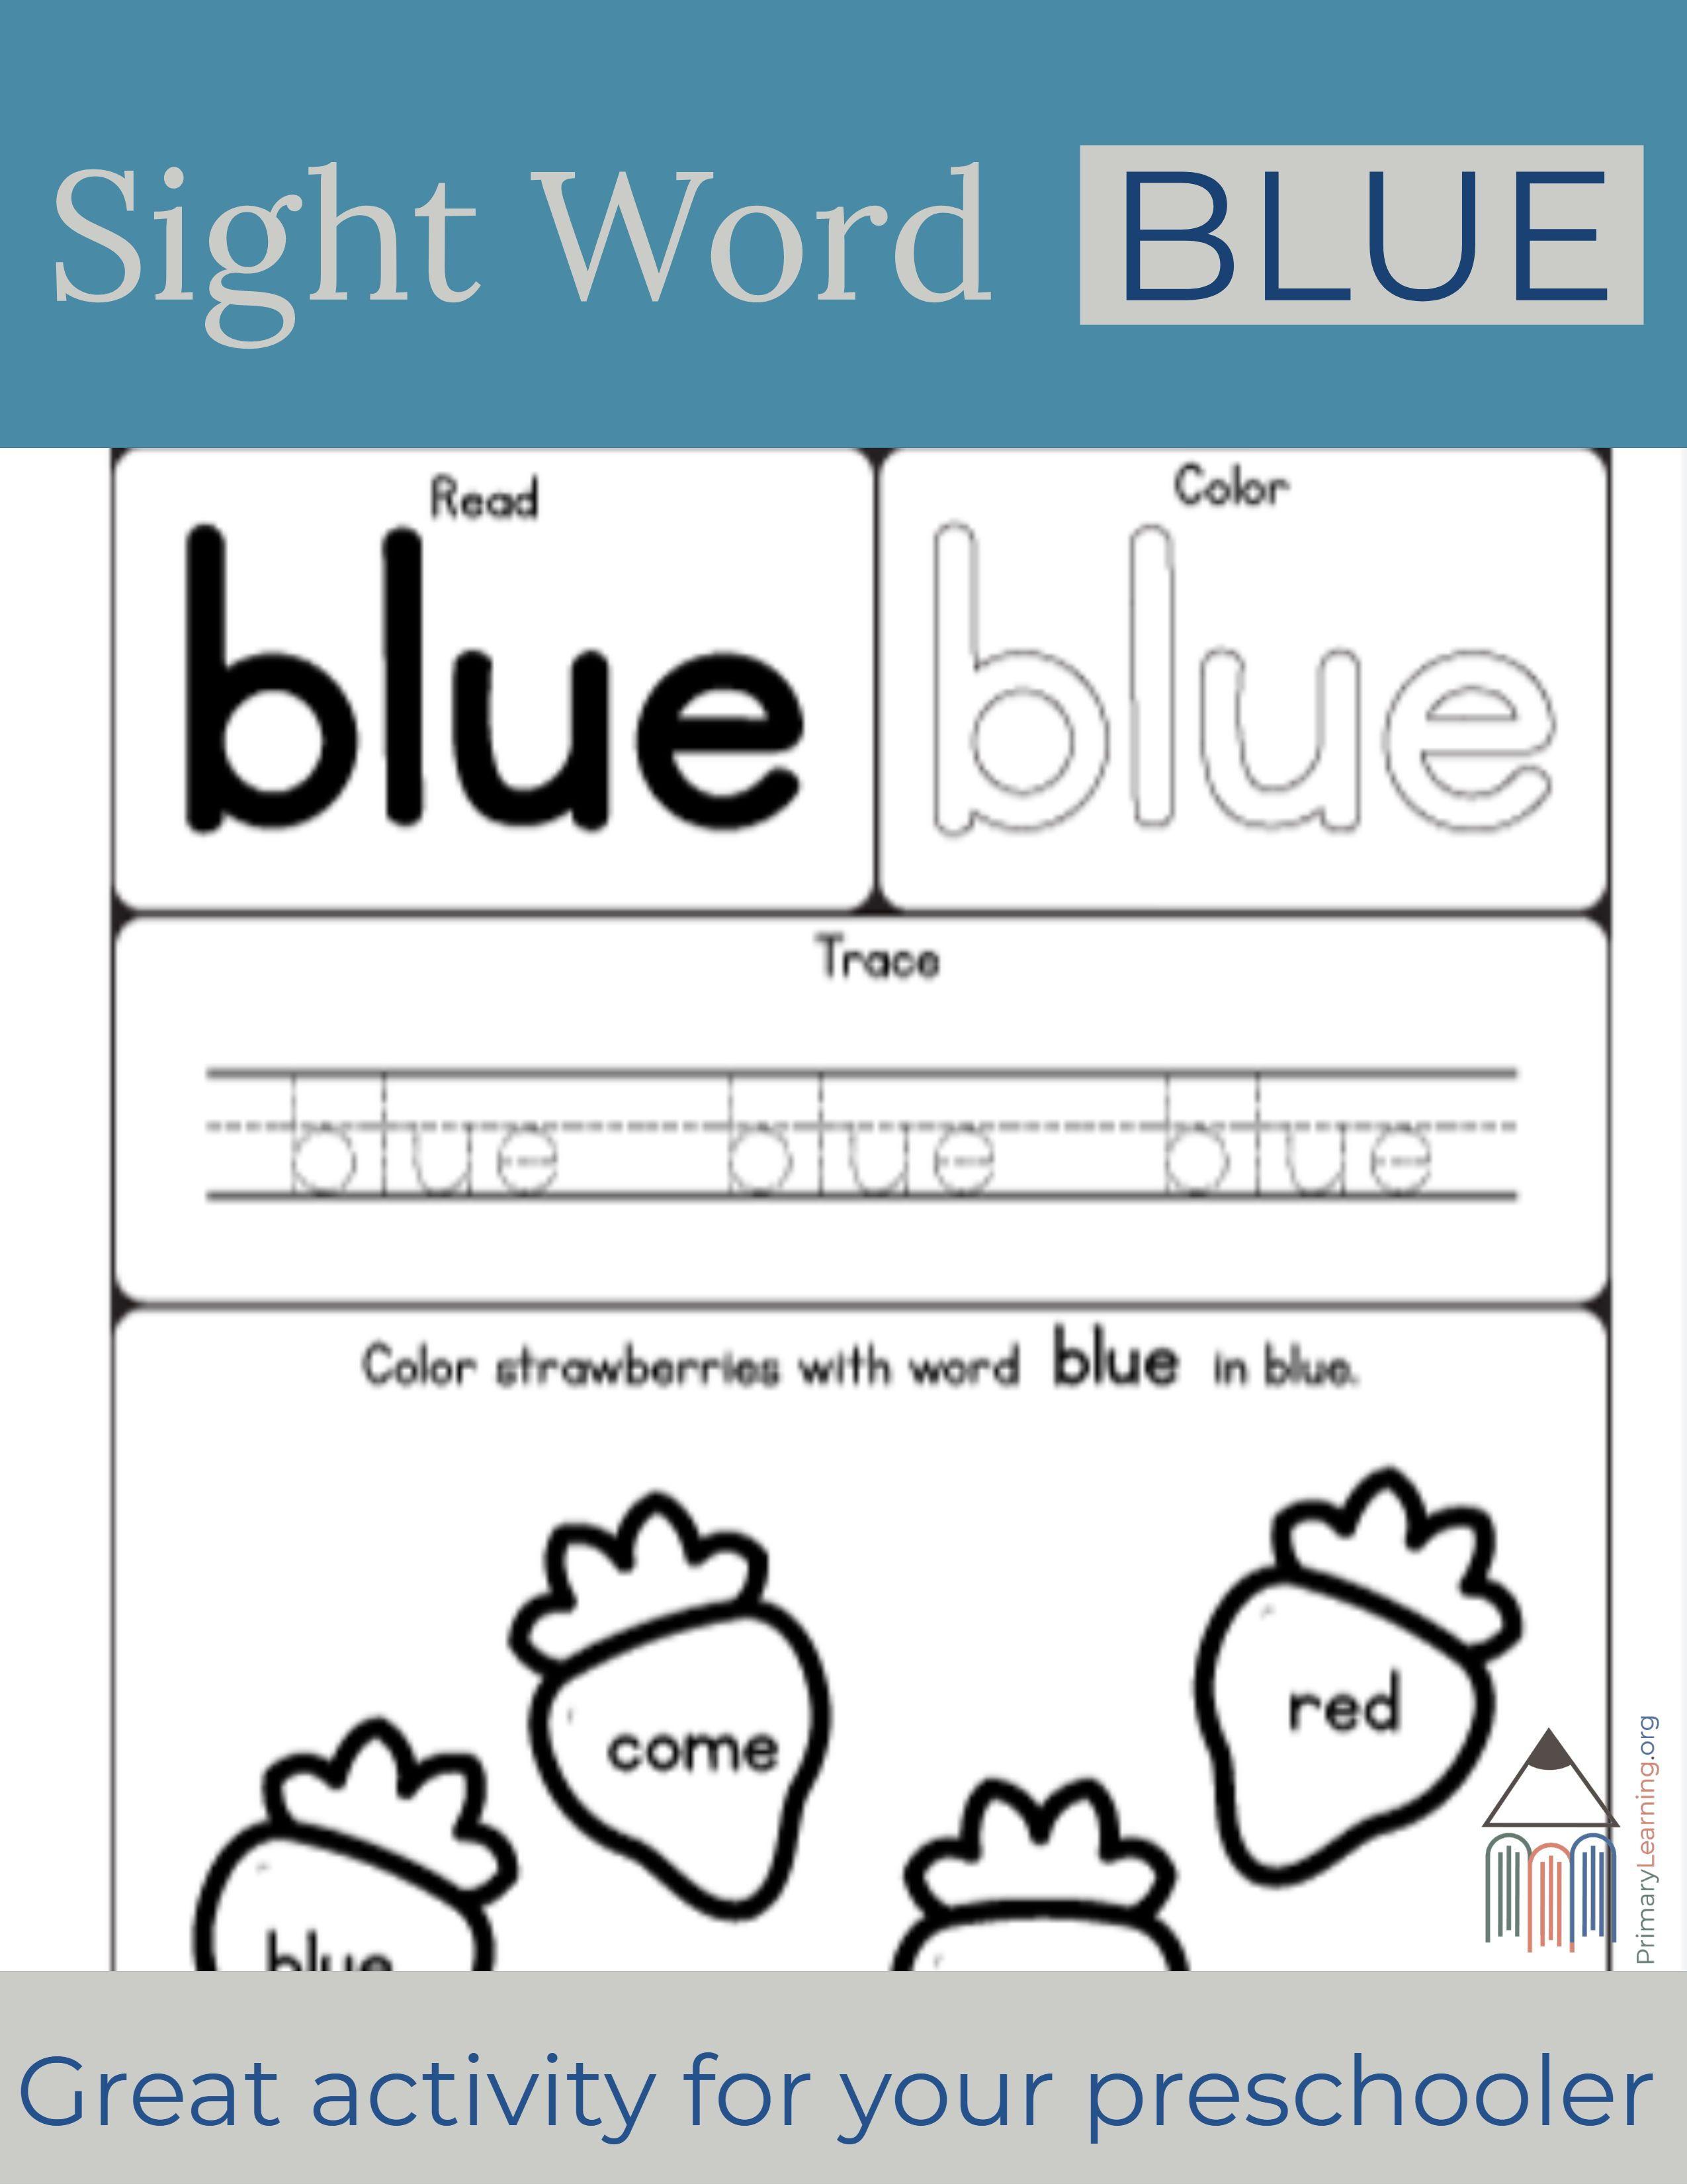 Sight Word Blue Worksheet